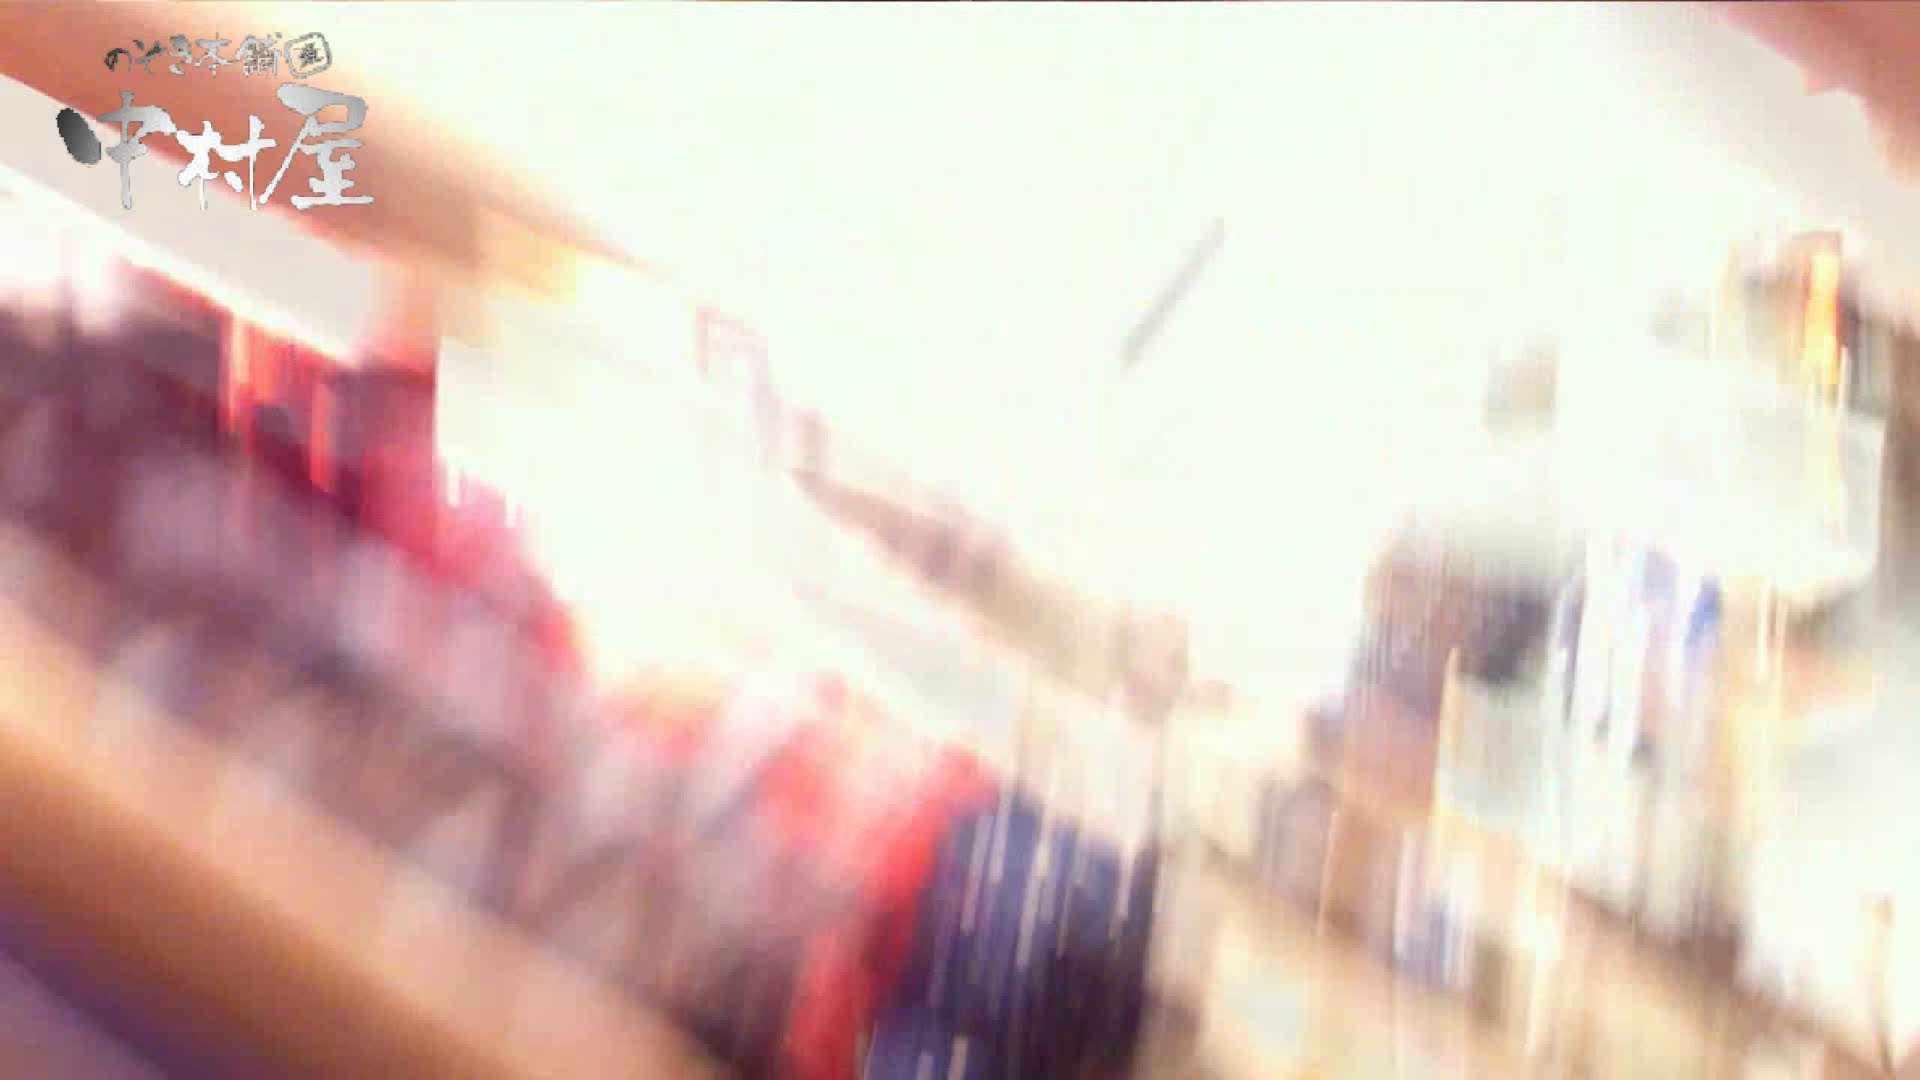 vol.57 美人アパレル胸チラ&パンチラ 激カワ店員のおっぱい 接写 AV動画キャプチャ 50連発 42